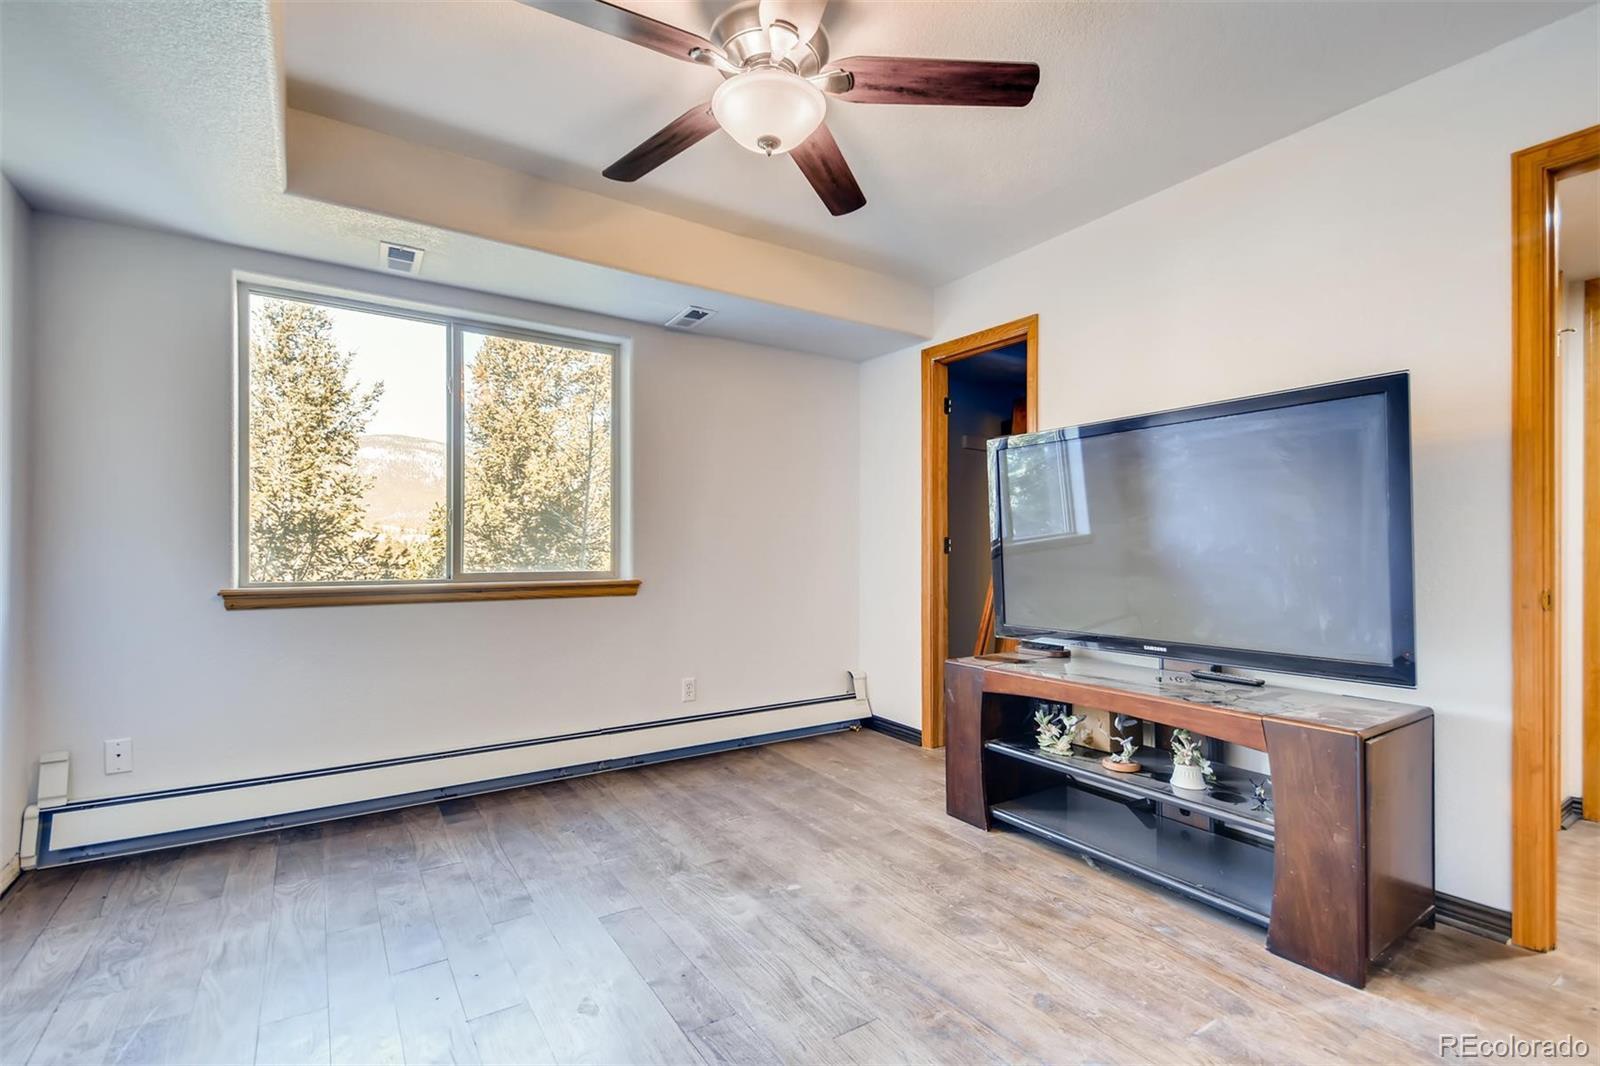 MLS# 8127847 - 9 - 515 Gold Flake Terrace, Bailey, CO 80421